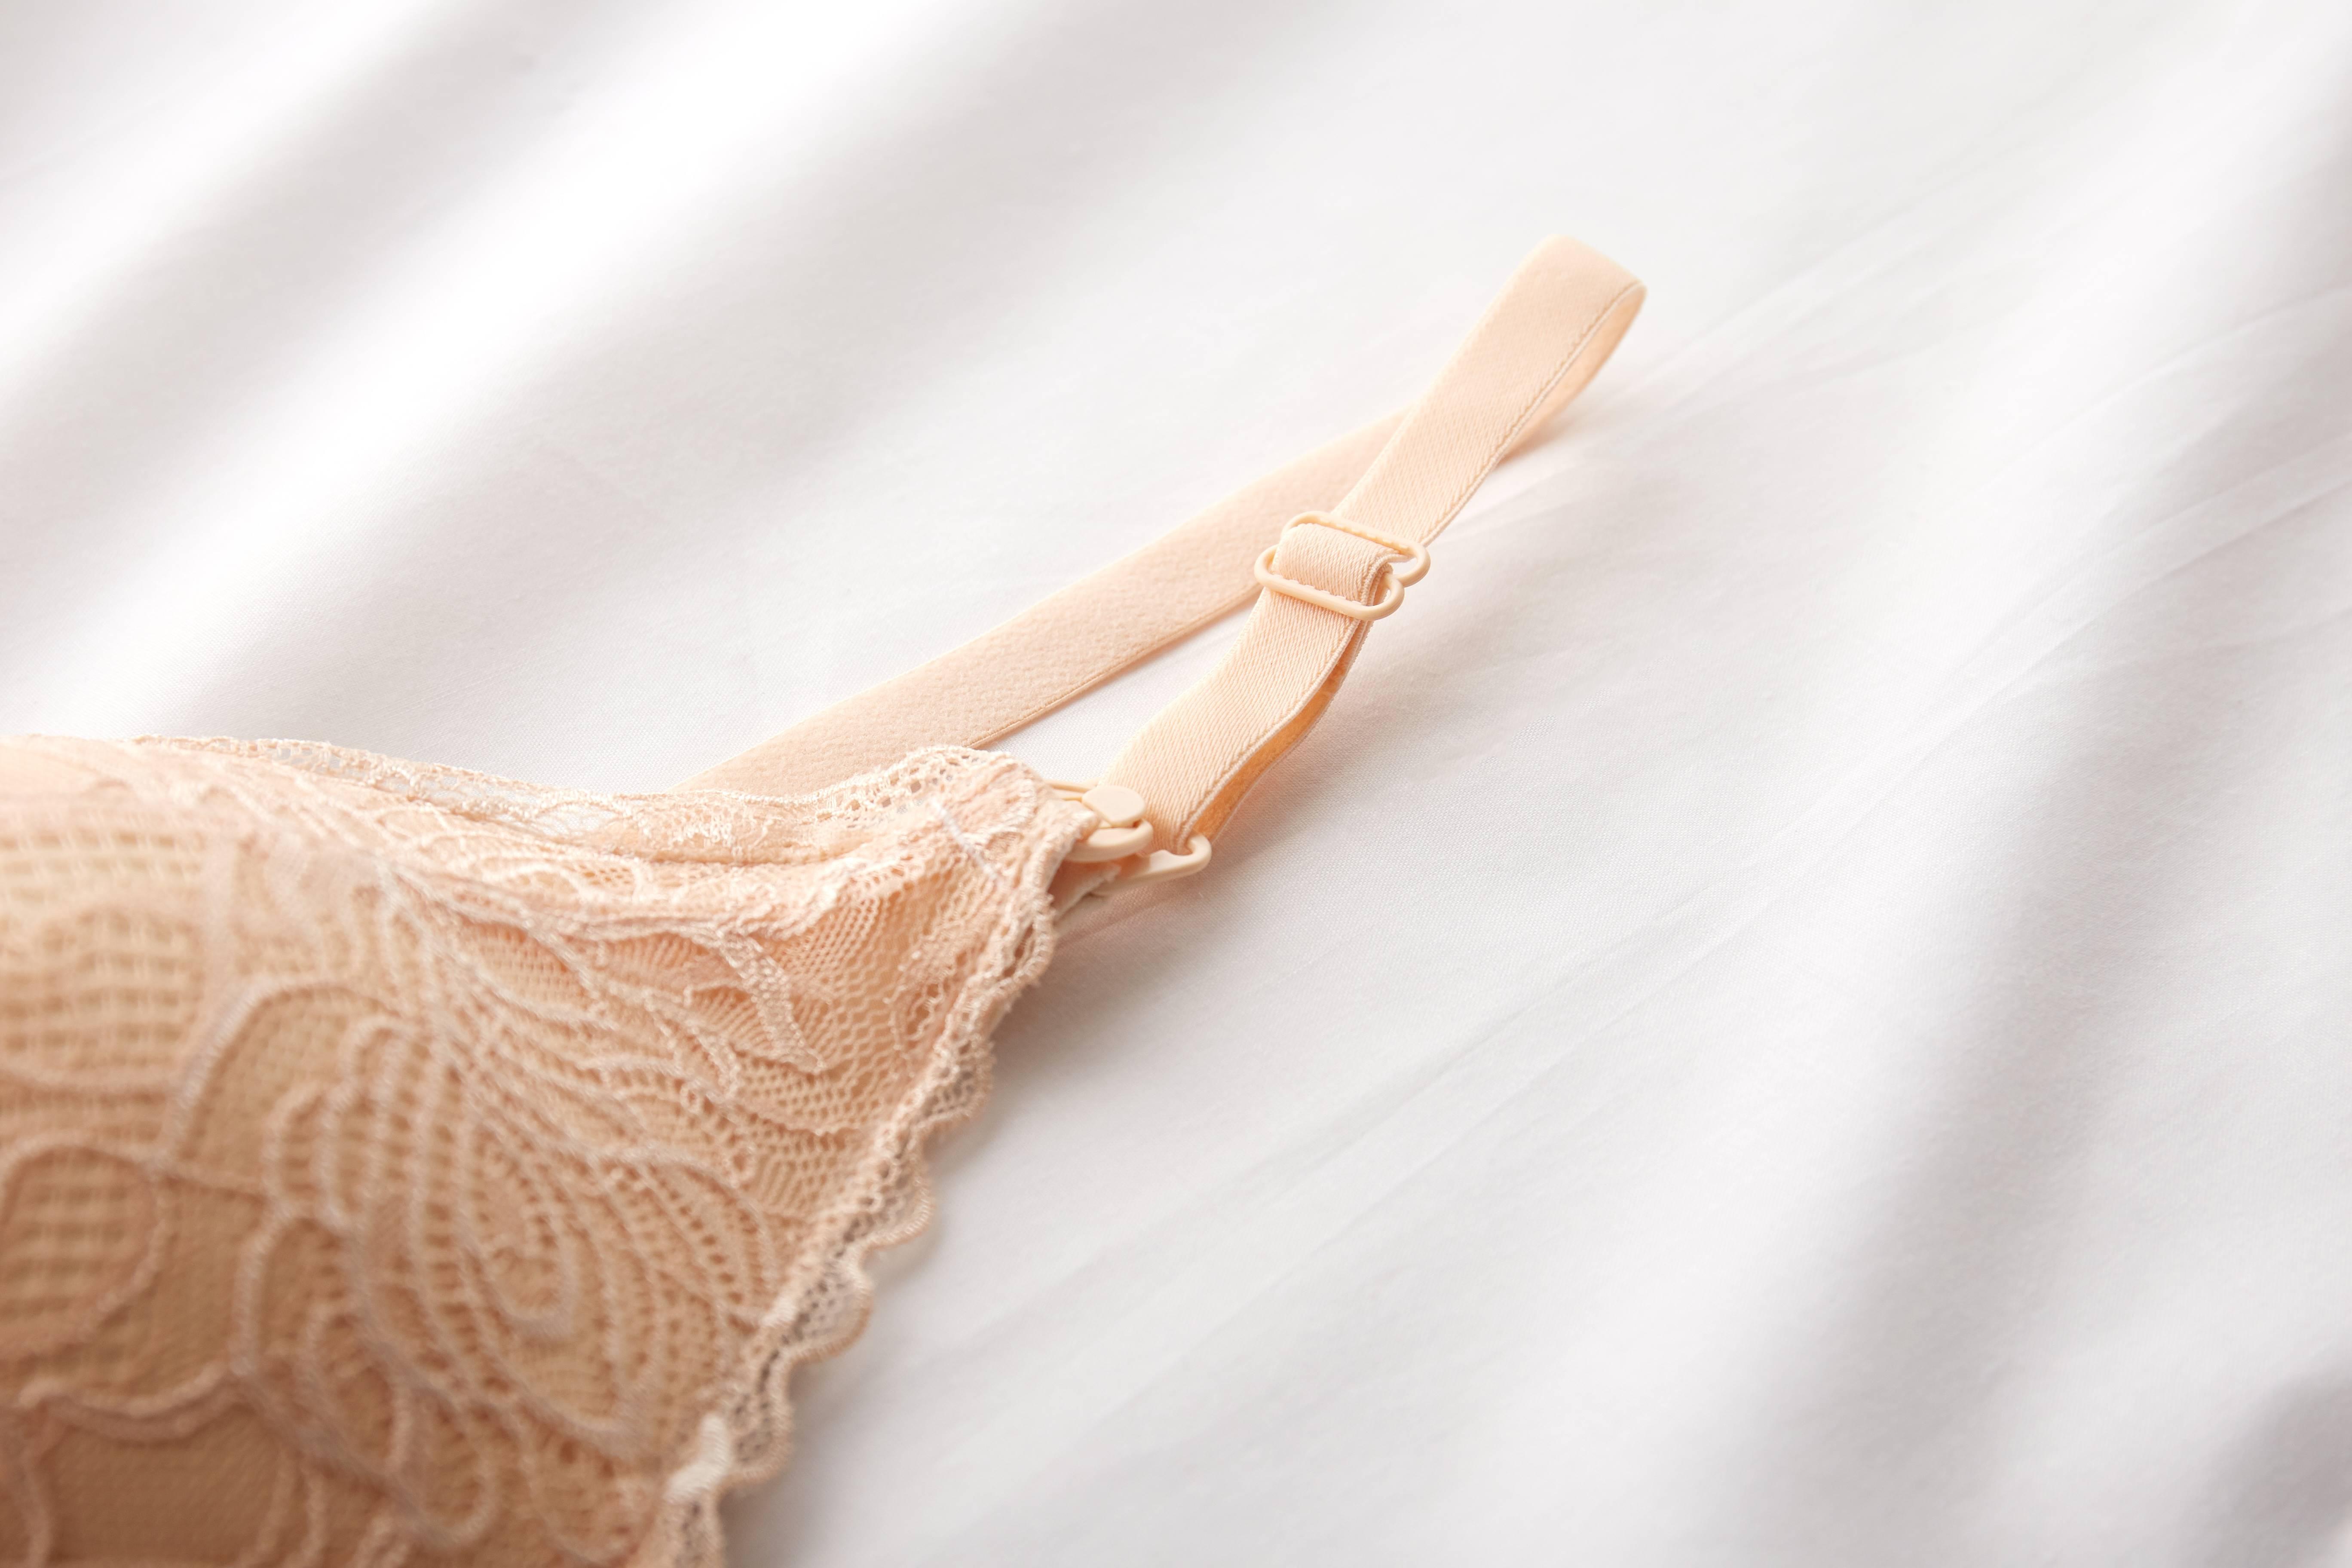 Sostén nude tipo bralette